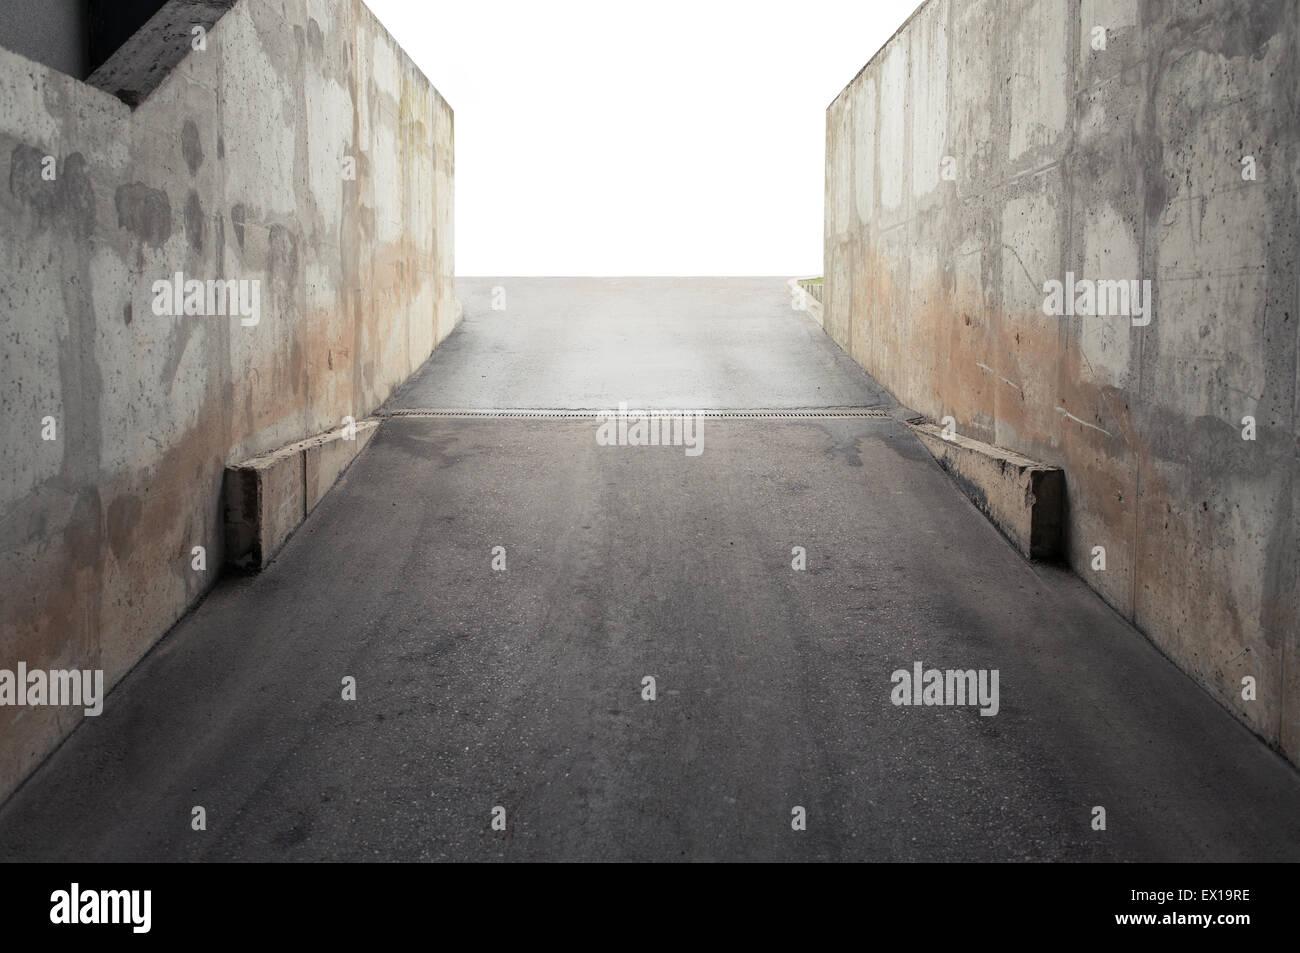 Garage Entrance, Concrete Walls Surrounding   Stock Image